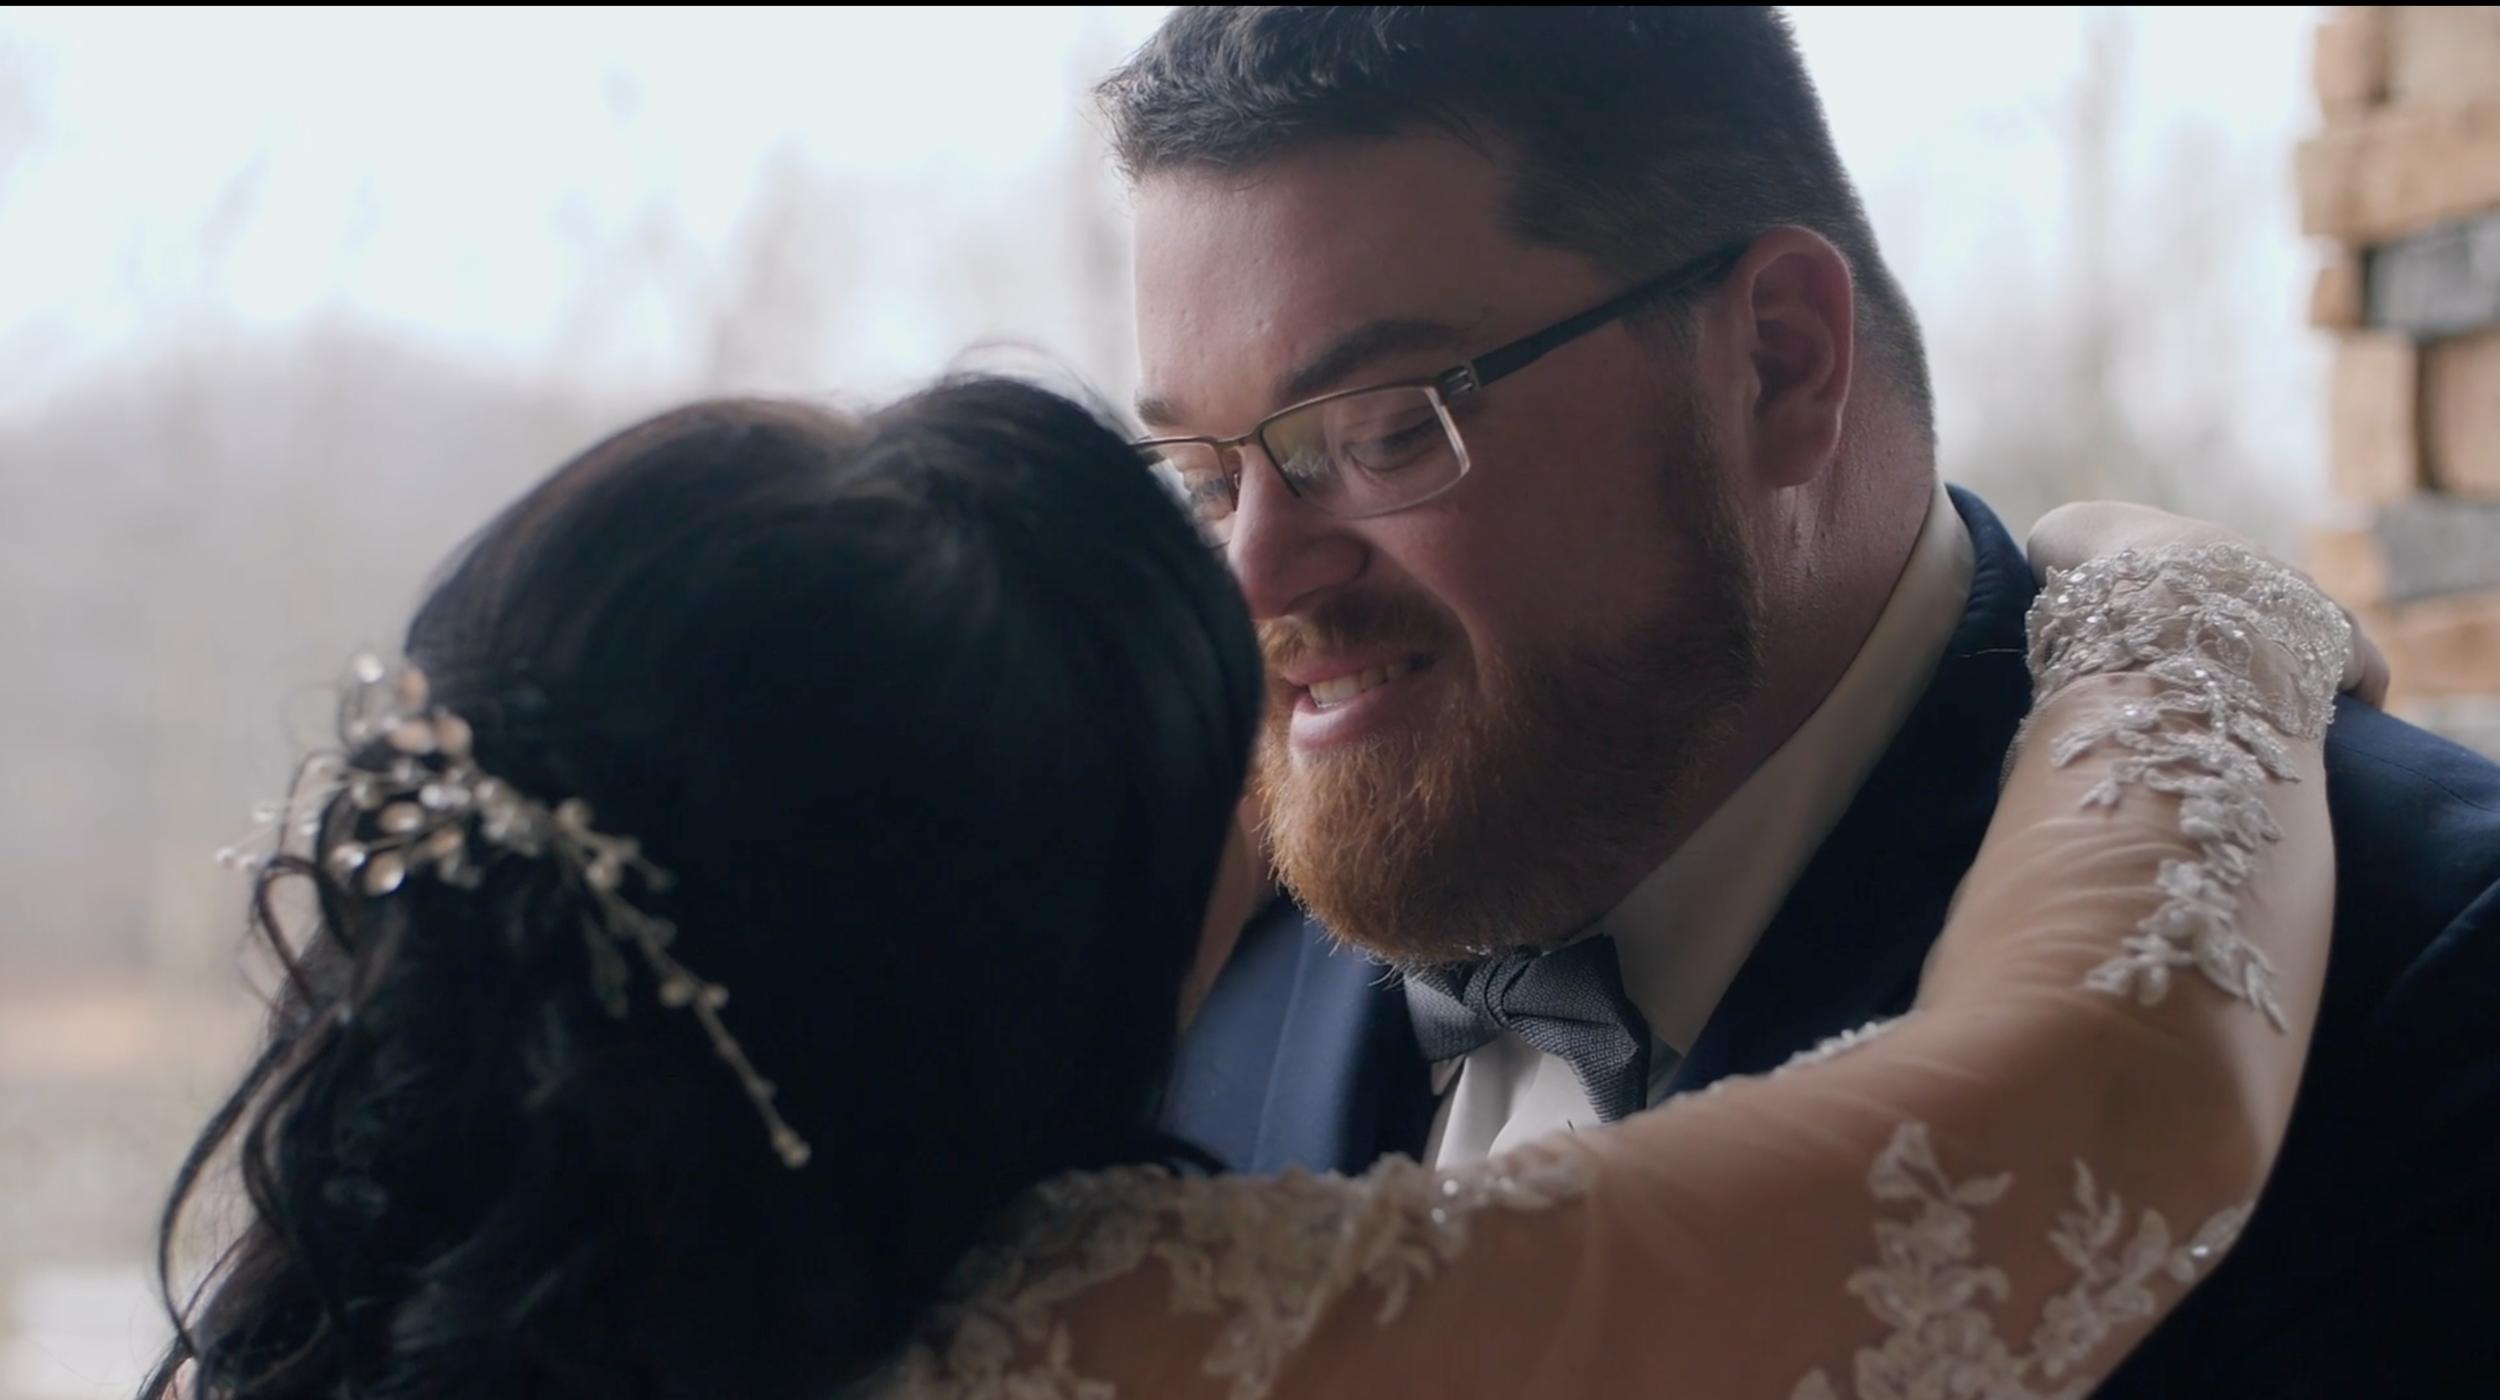 Bride groom wedding idea winter reclick kiss romantic intimate